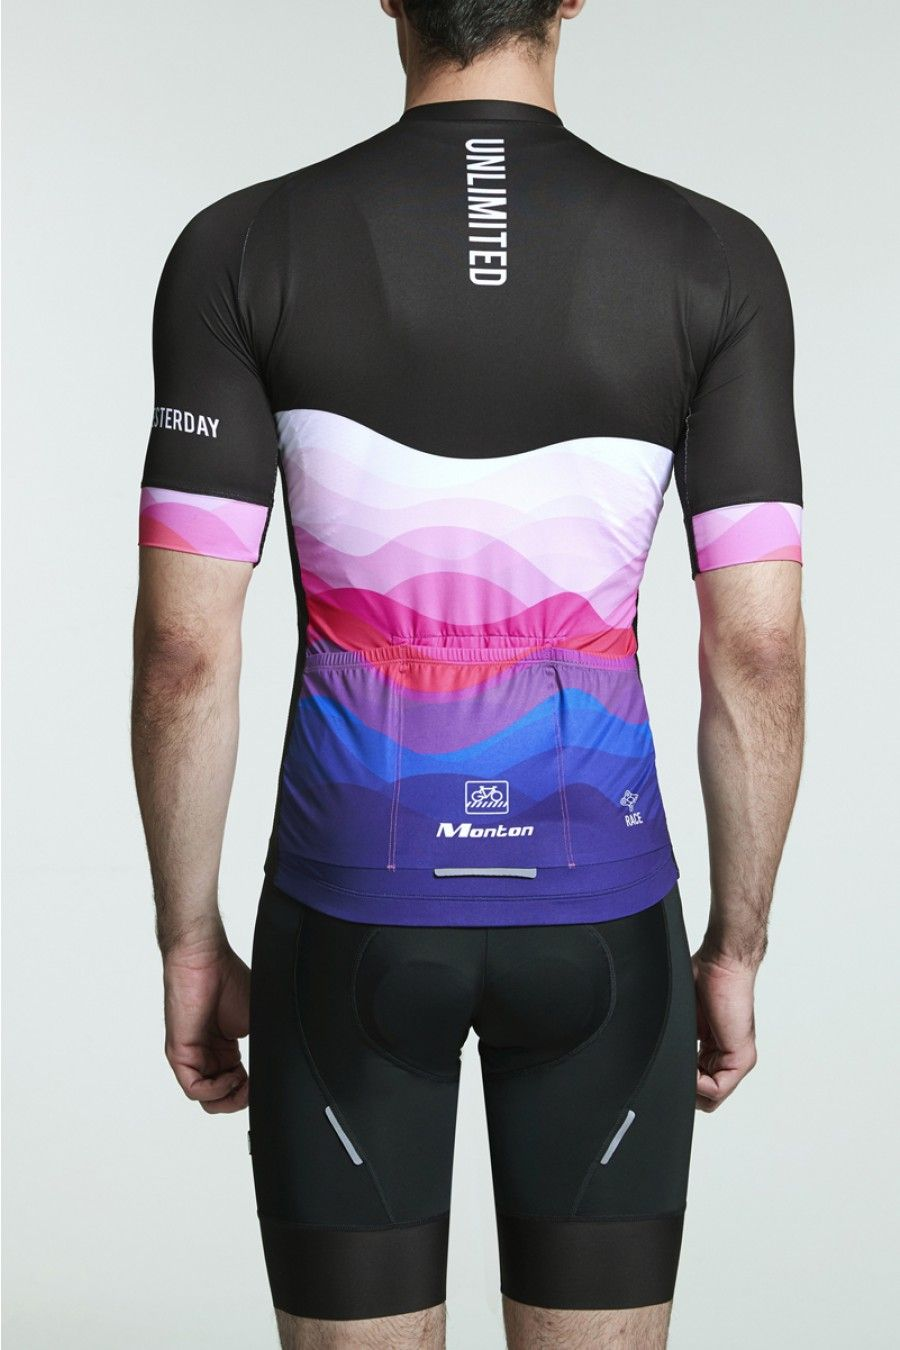 road cycling jerseys  7c359b1f0